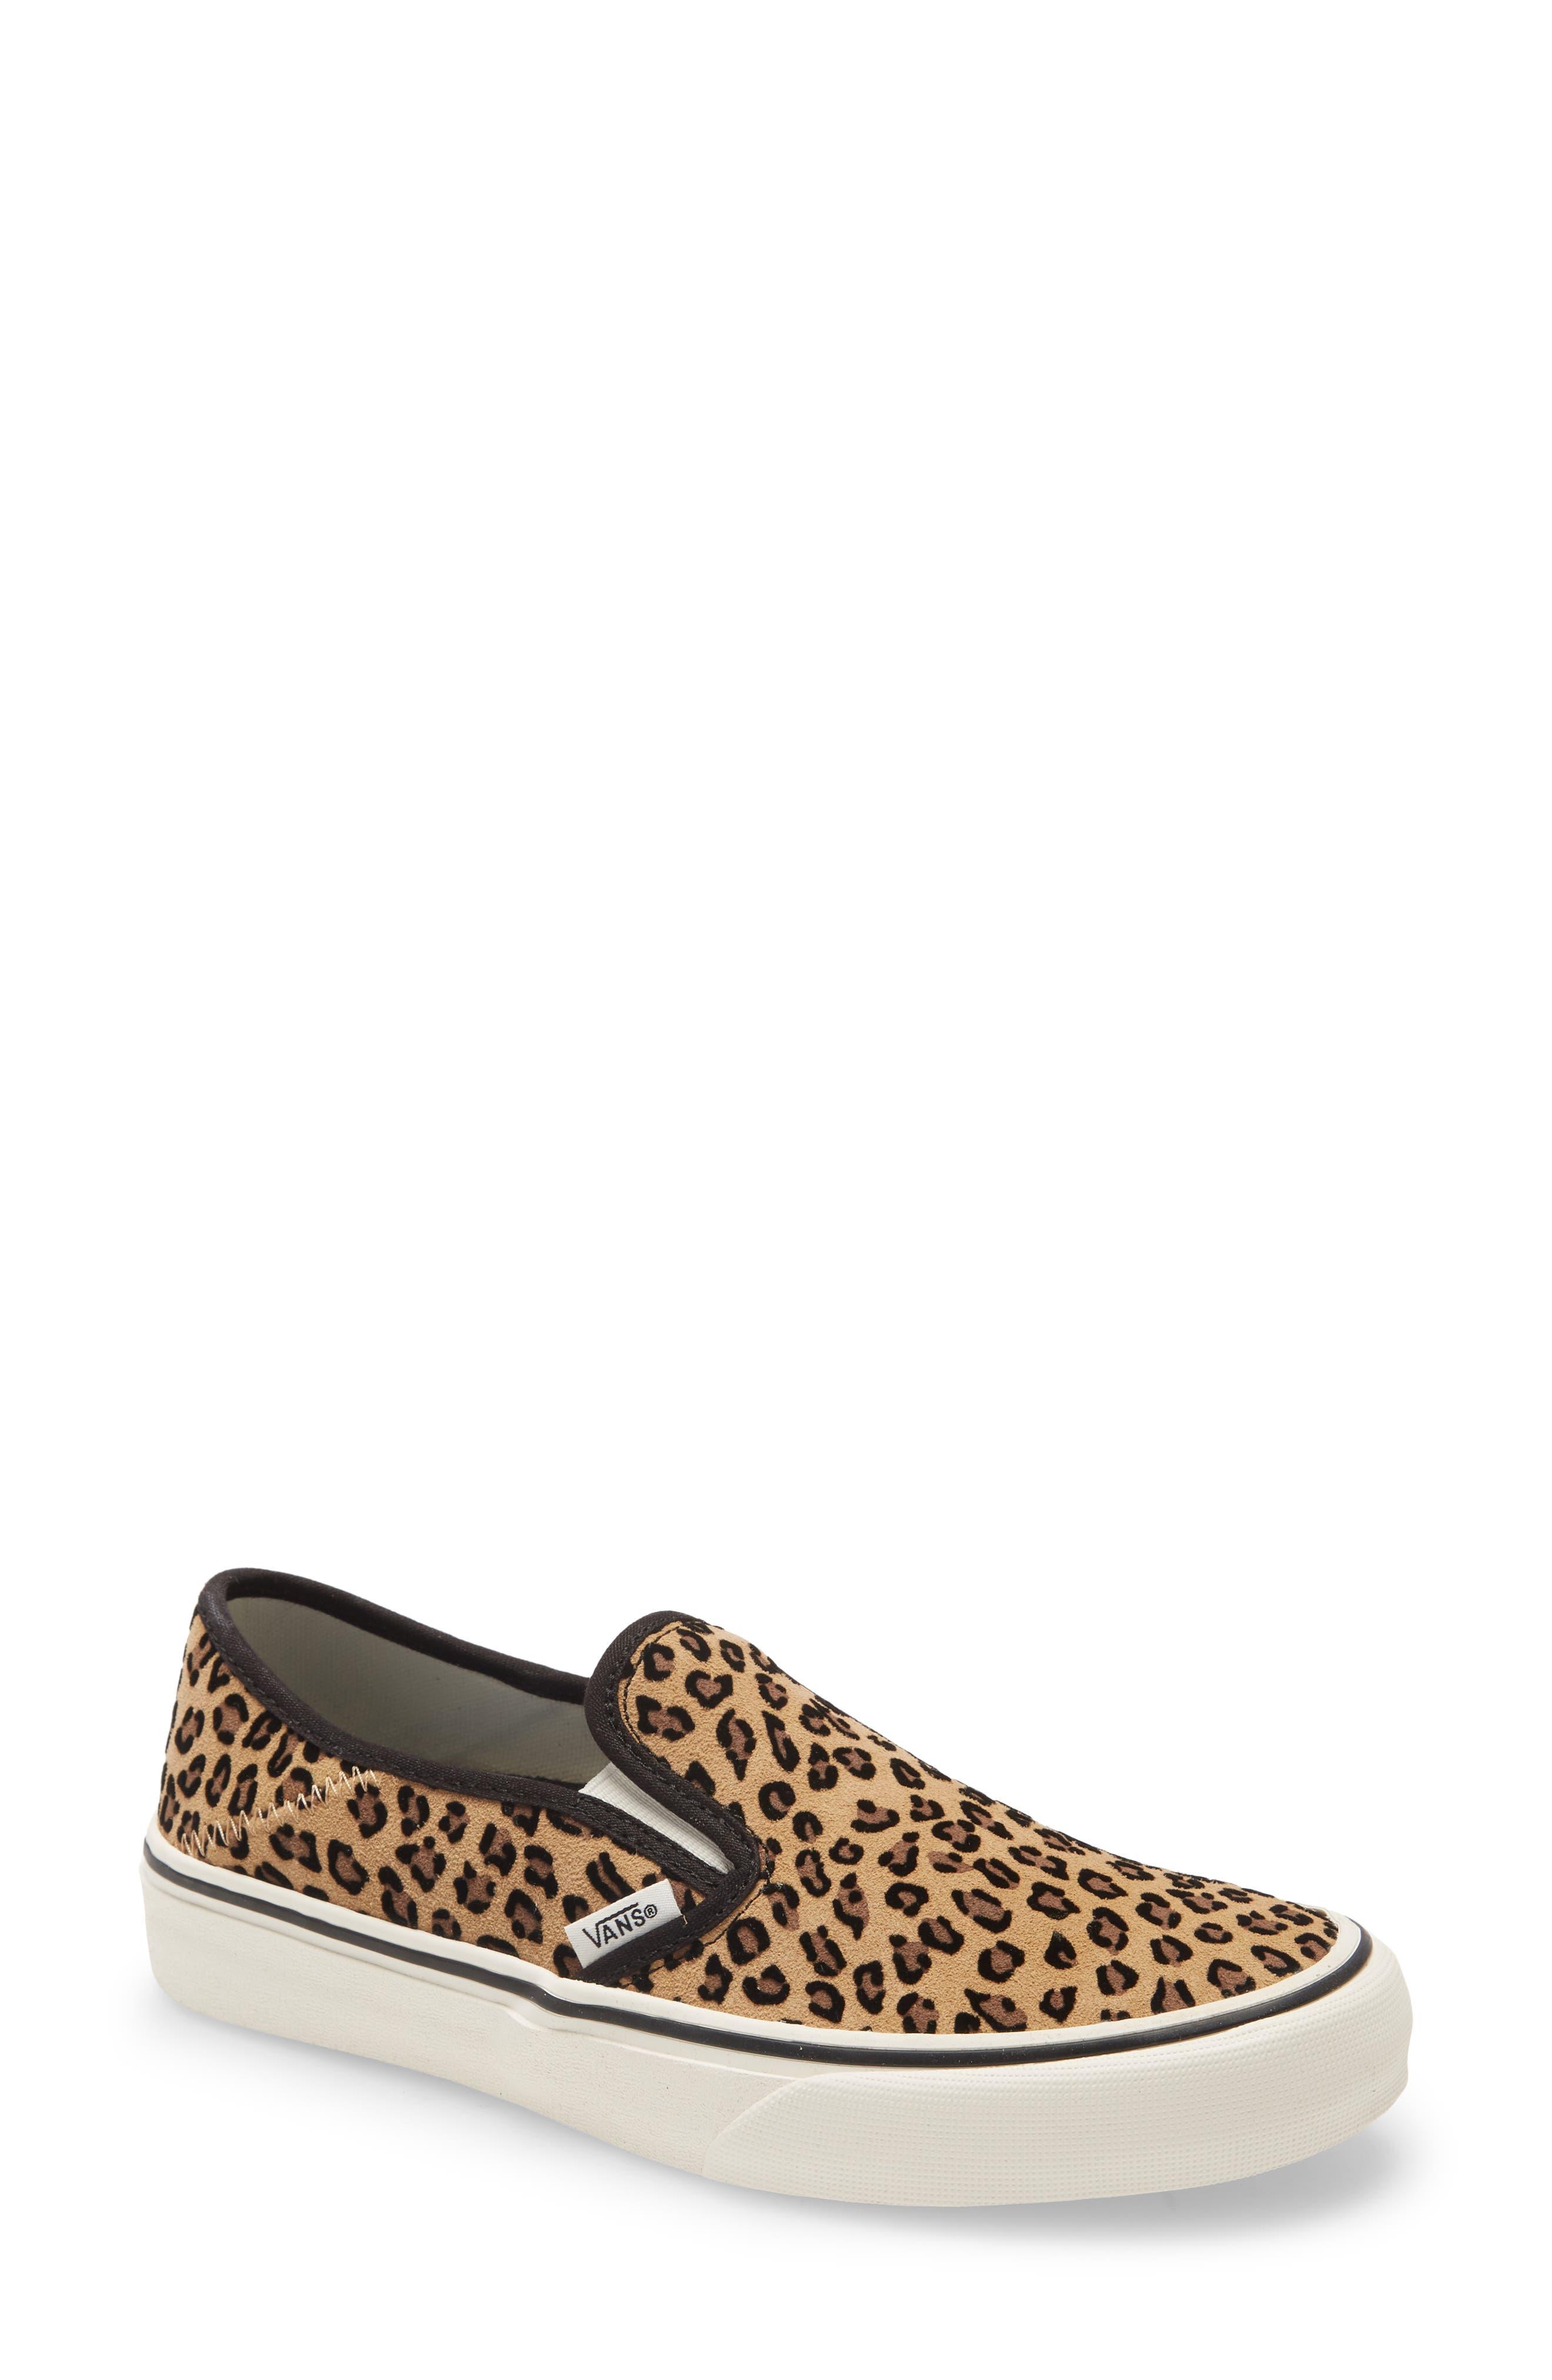 Vans Convertible Slip-On Sneaker